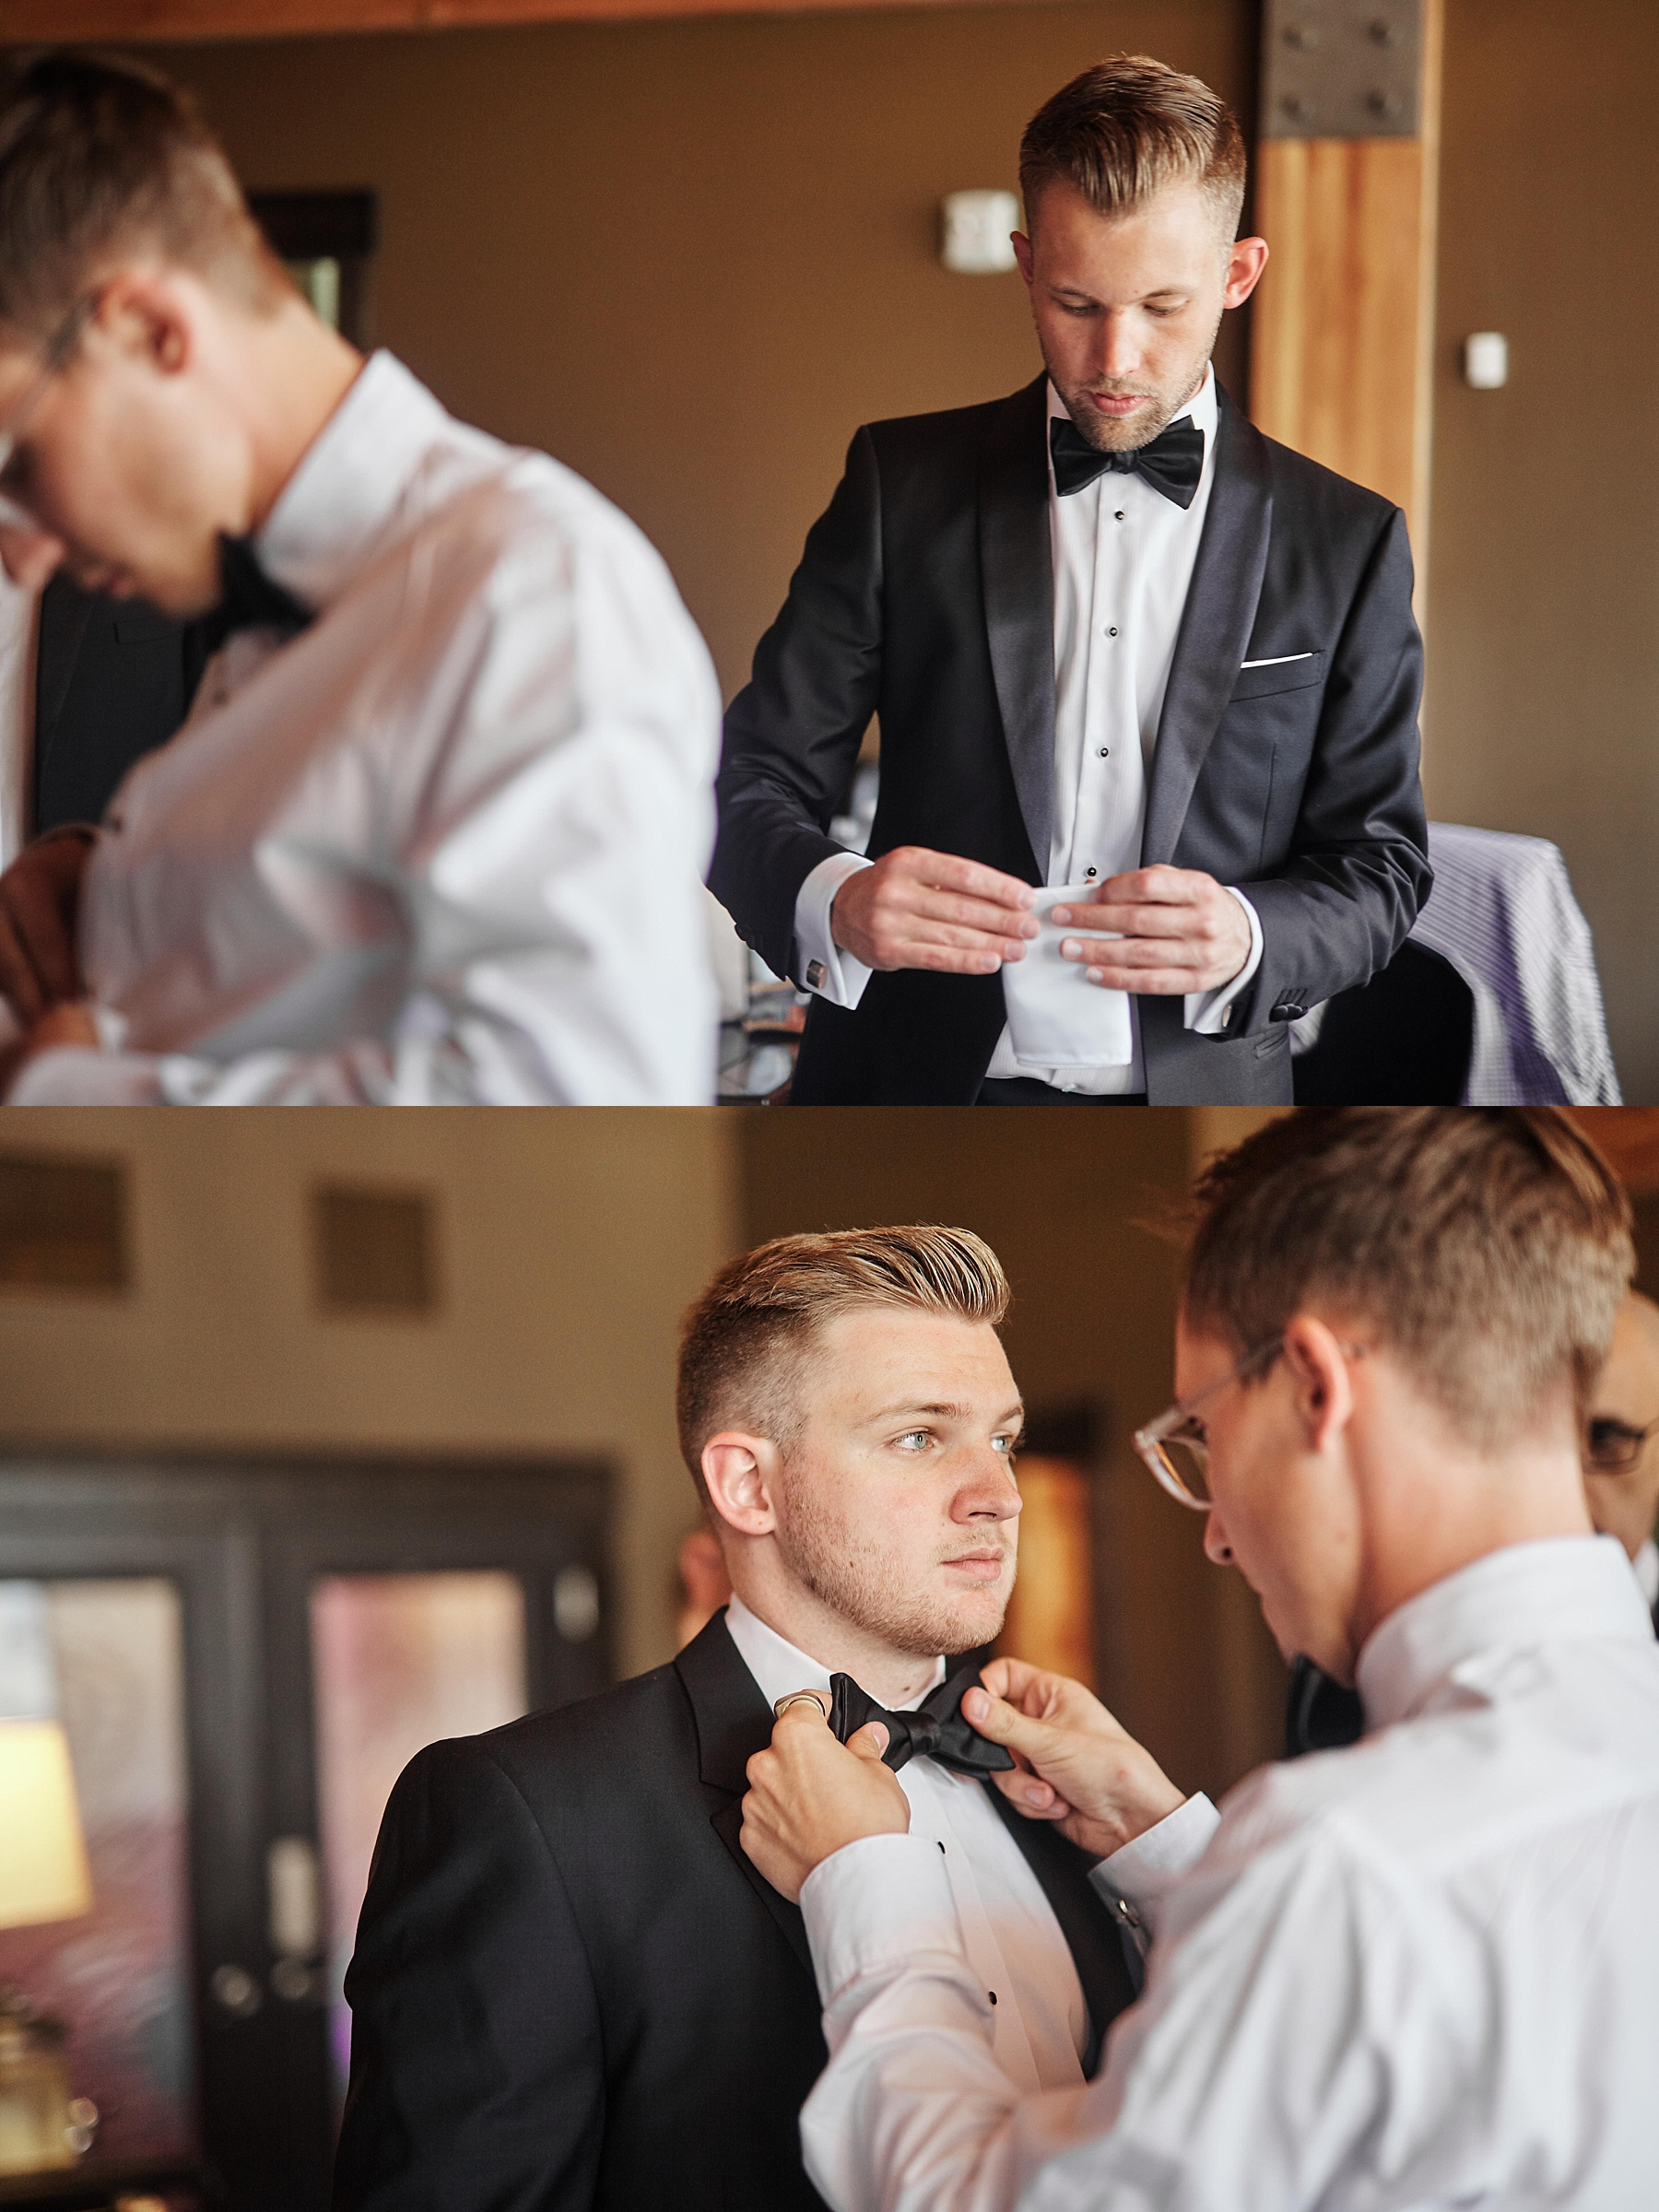 ABULAE-Wedding-Saint-paul-MN-Josh-Sofia-Wedding-Mears-Park_0713.jpg